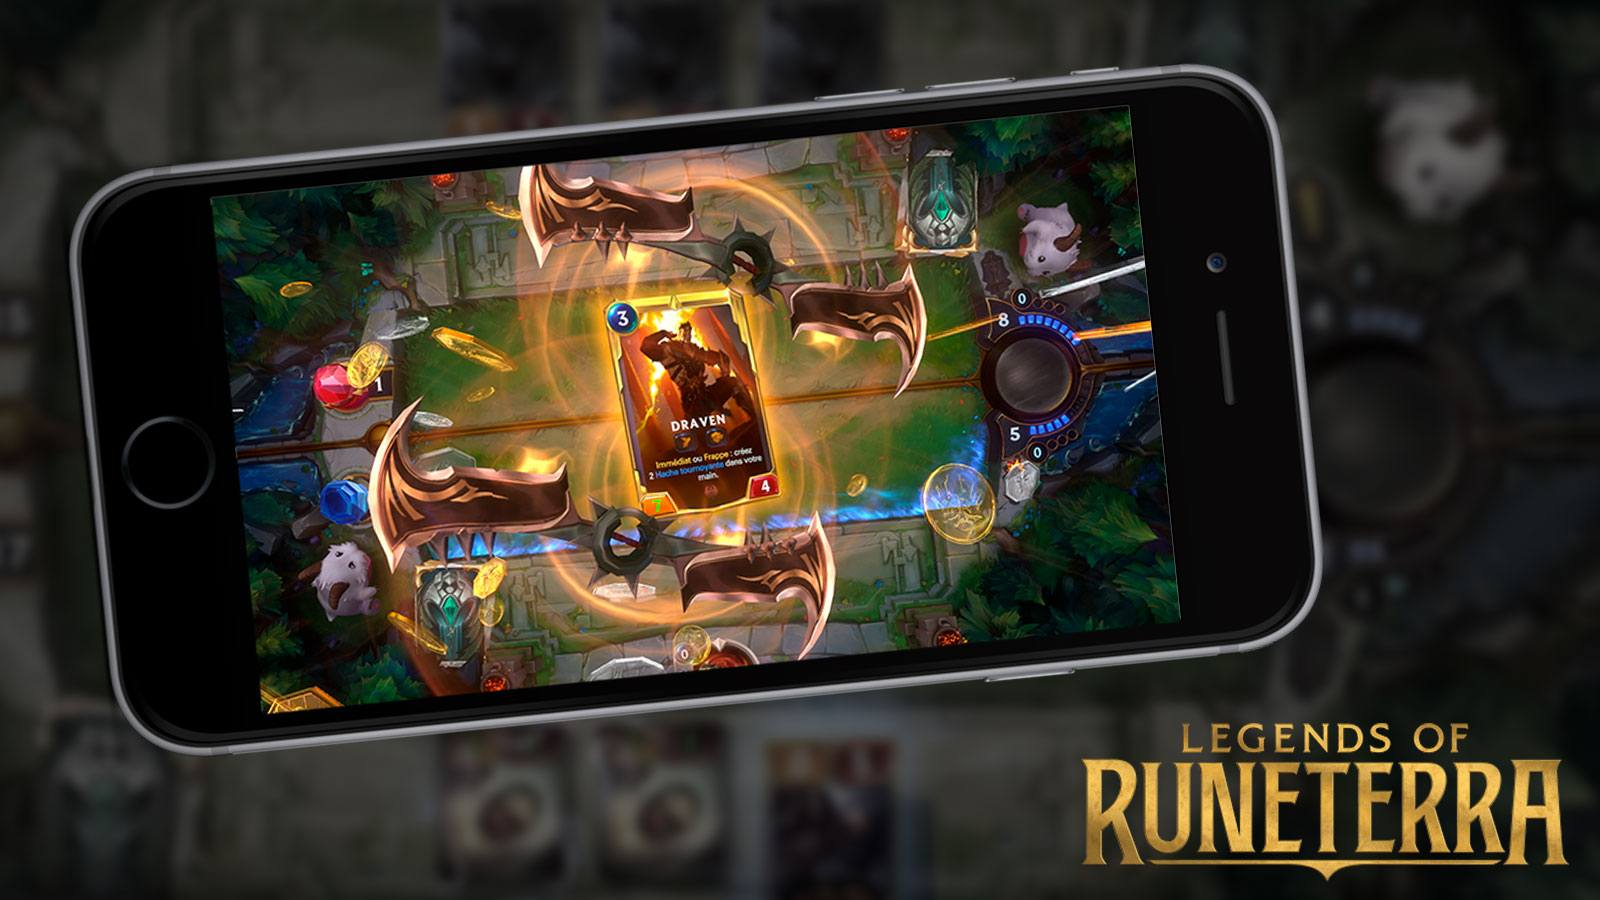 Juega Legends of Runeterra desde tu teléfono móvil.